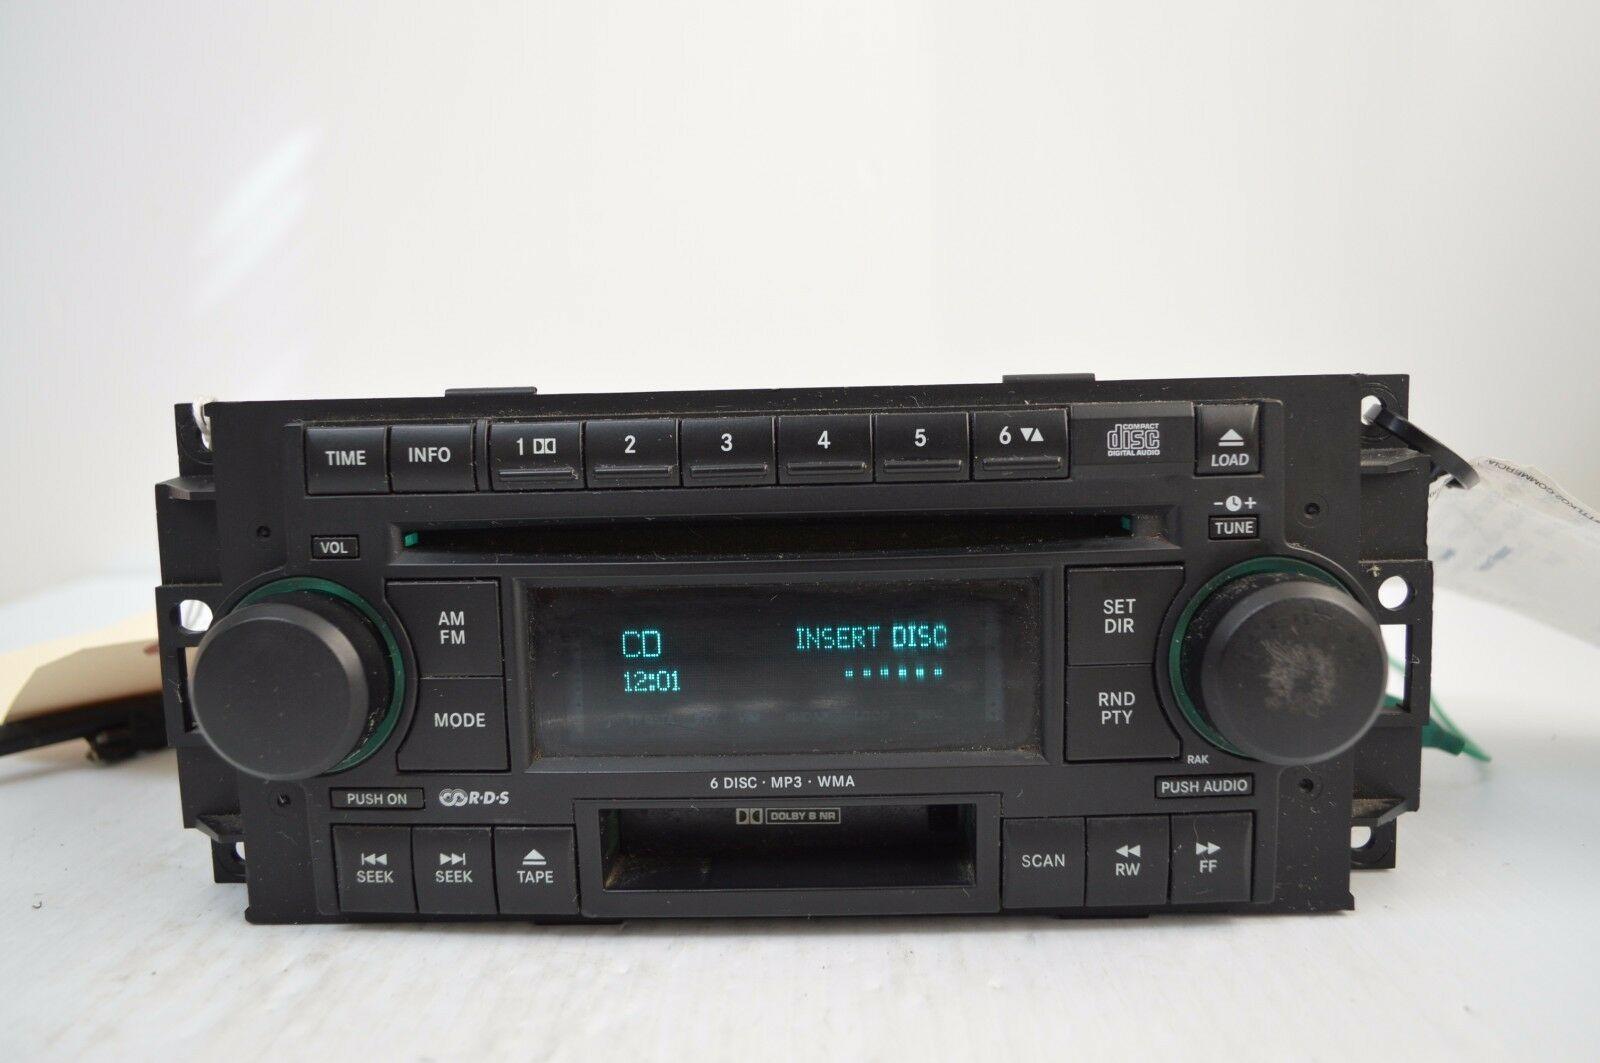 2005-2007 CHRYSLER DODGE RADIO 6 CD MP3 CASSETTE PLAYER TESTD 5091523AL AA36#016 image 2